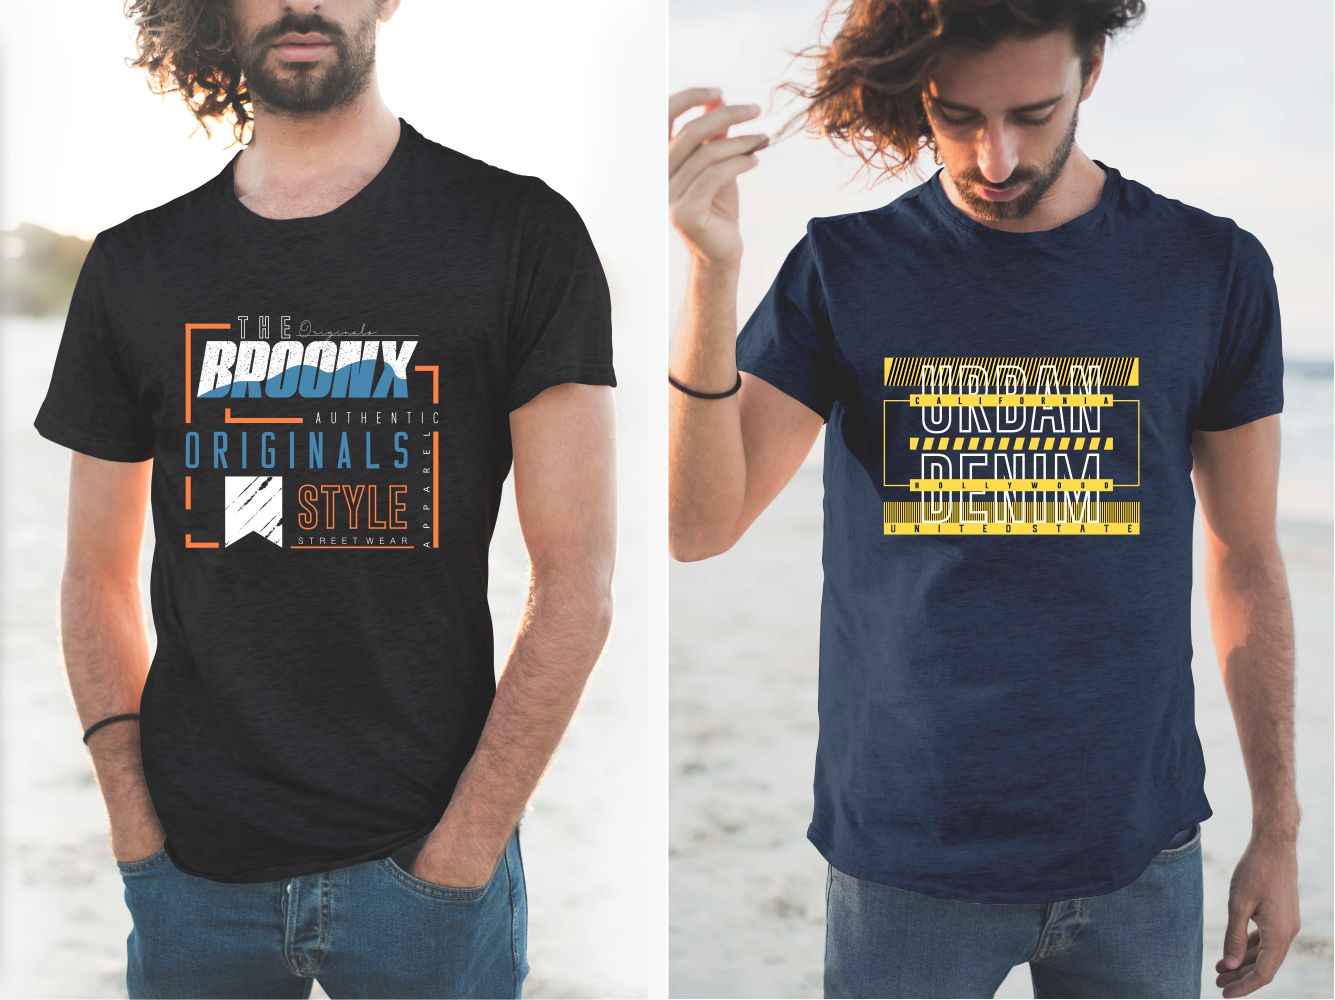 106 Urban T-shirt Designs Collection - 48